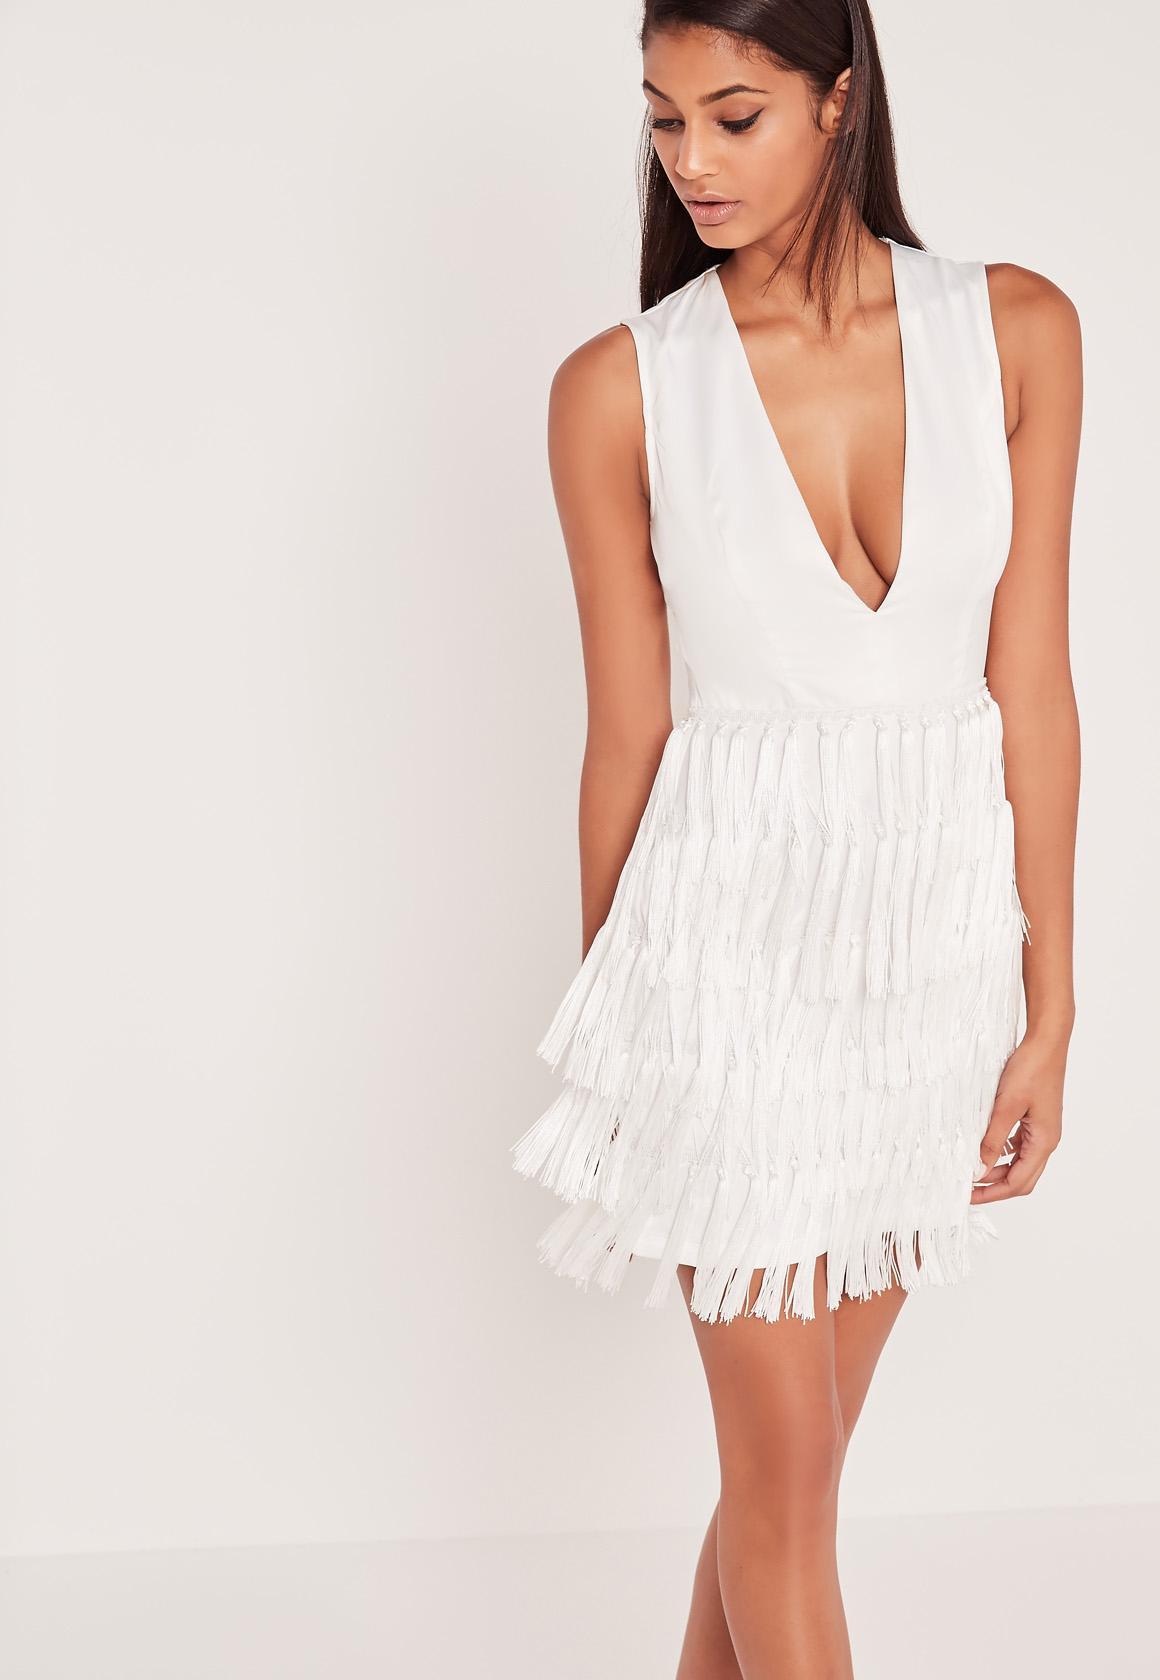 Carli Bybel Fringed Tassel Detail Bodycon Dress White | Missguided